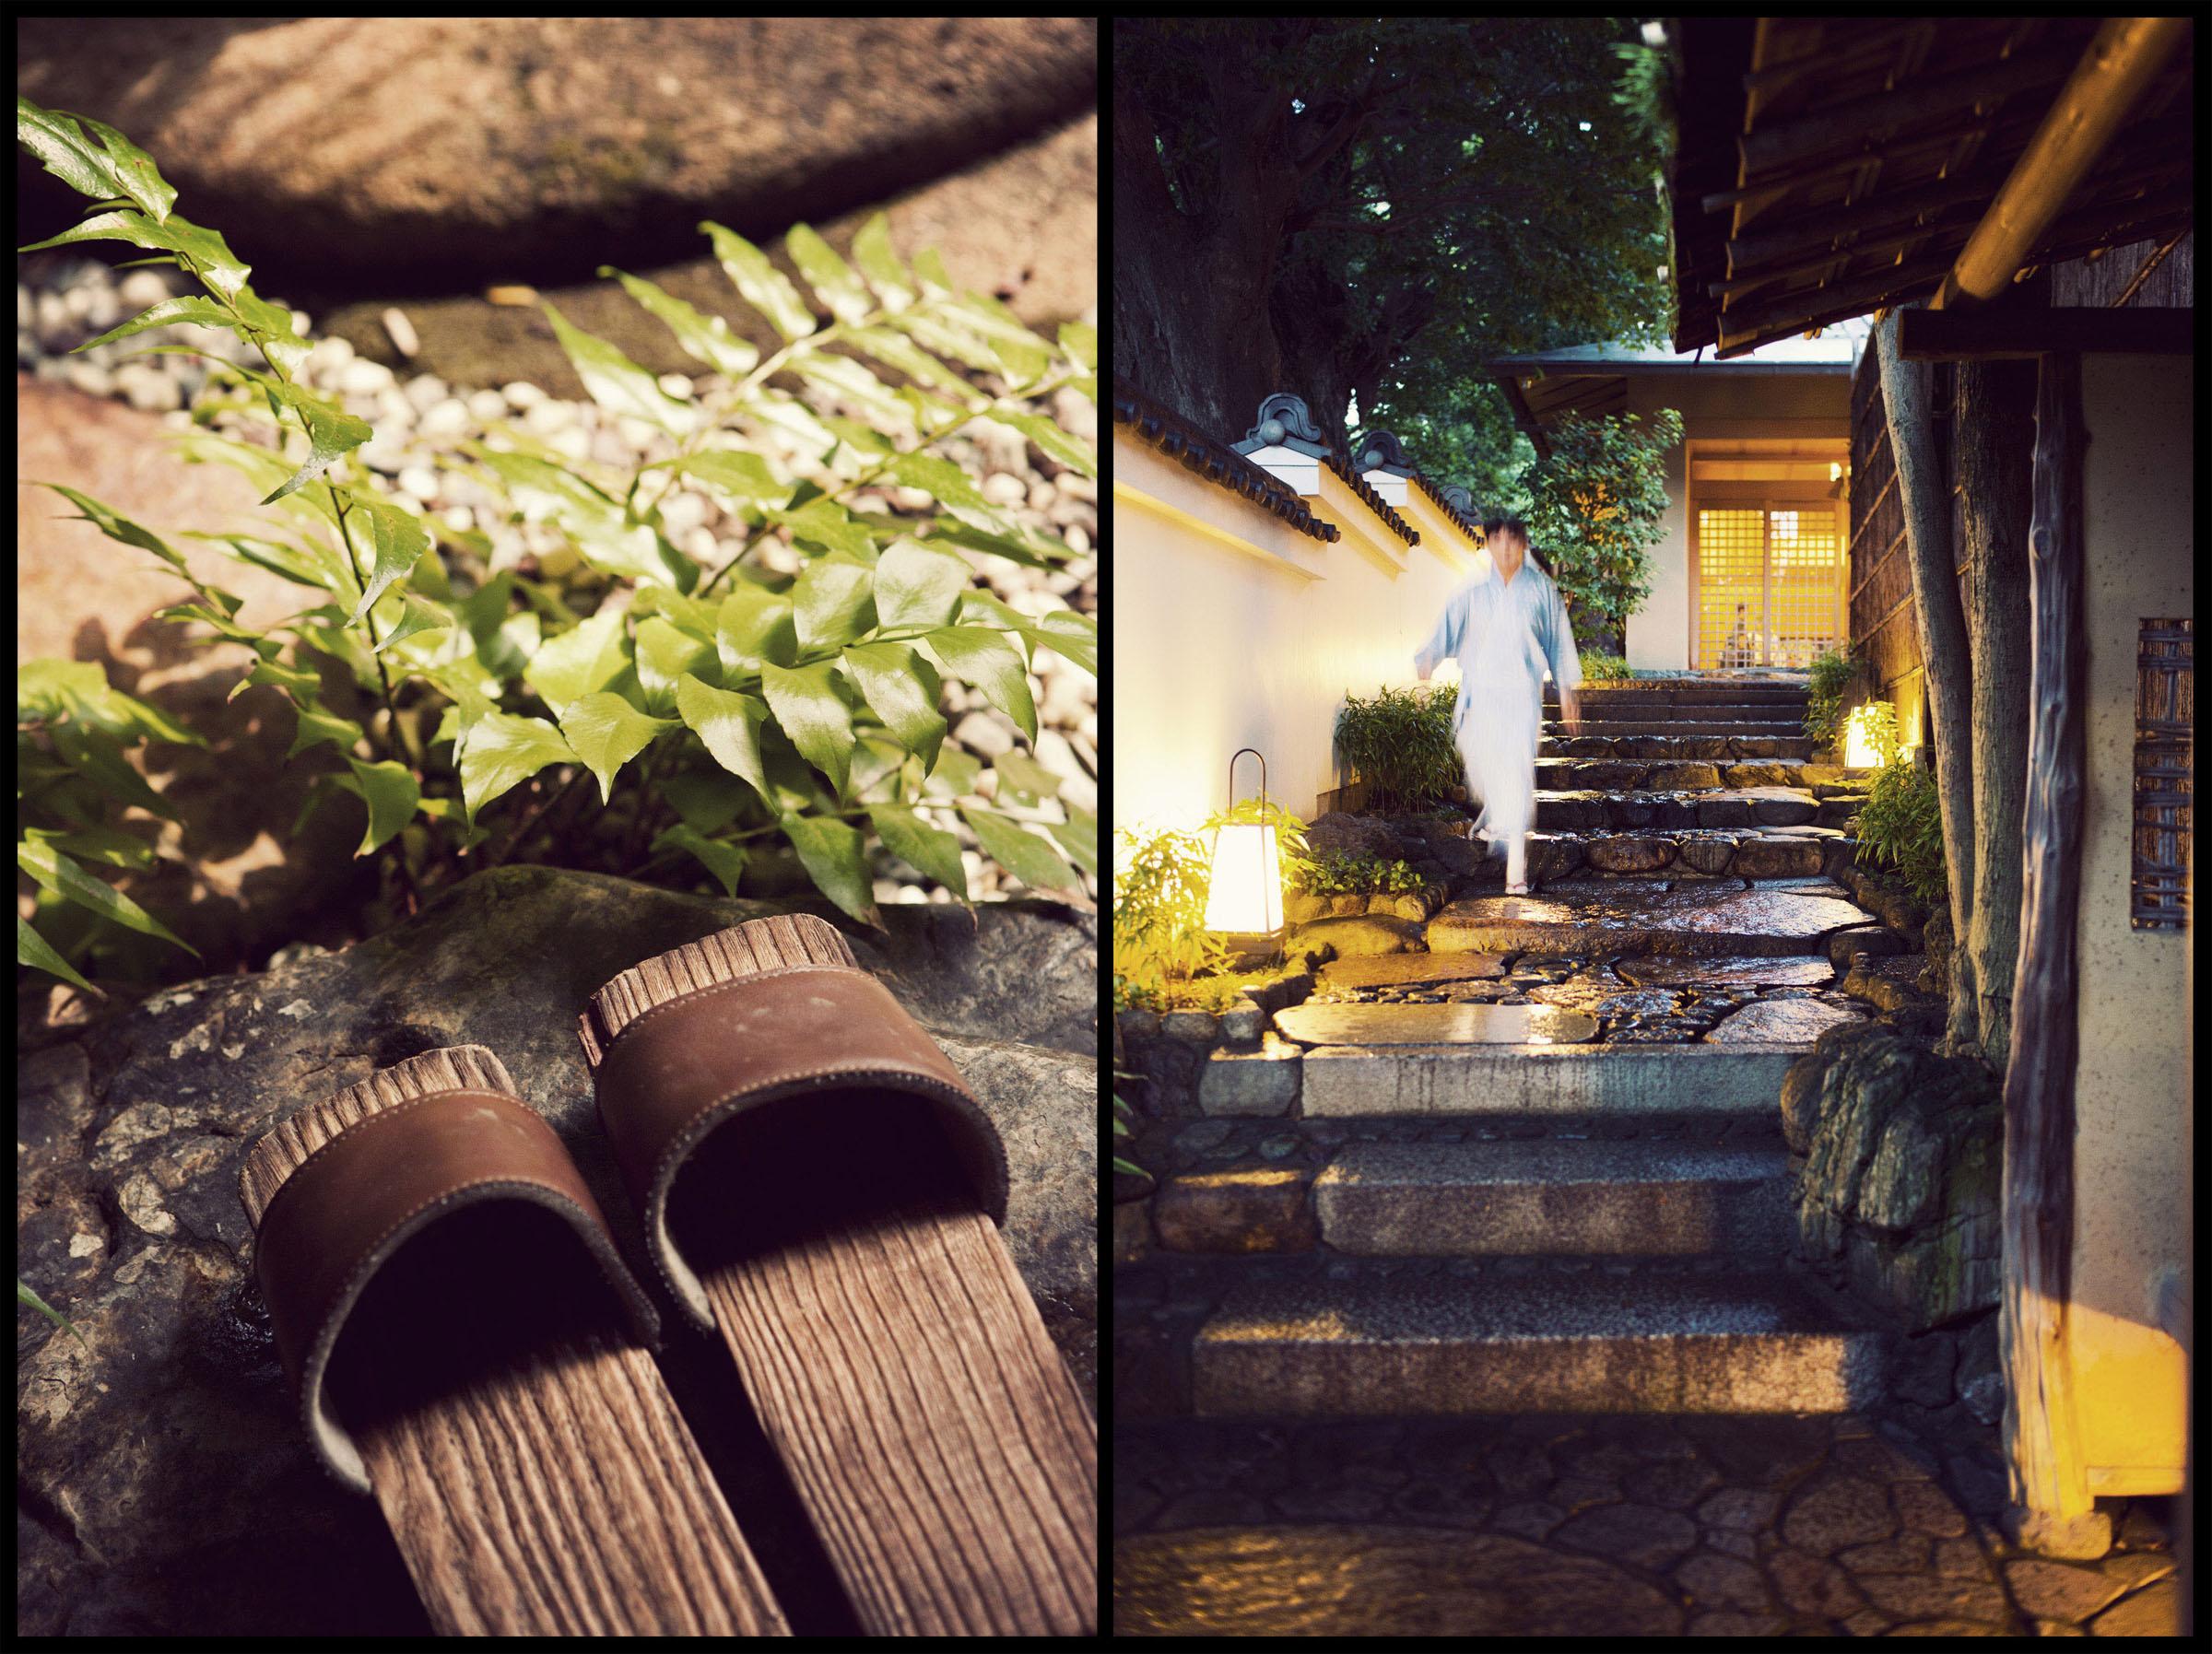 A garden view at the Yoshikawa Inn in Kyoto, Japan.  The entrance to the Gion Hatanaka Ryokan in Kyoto, Japan.